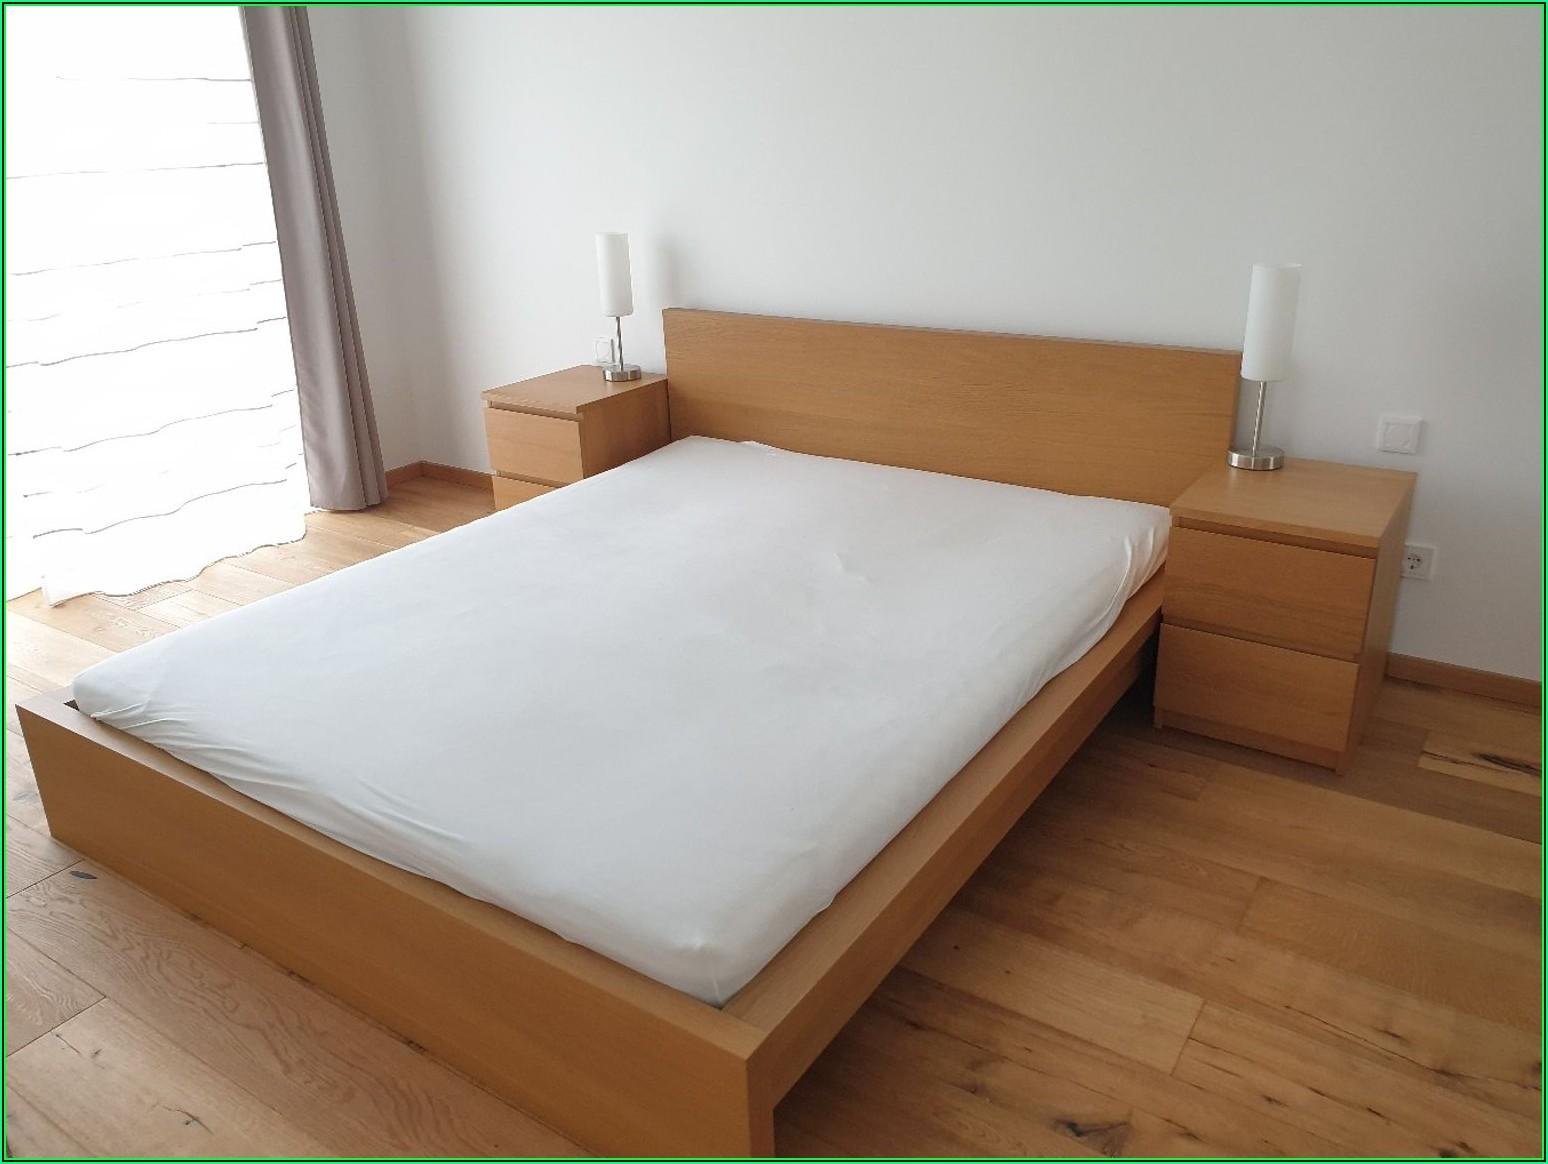 Ikea Malm Schlafzimmer